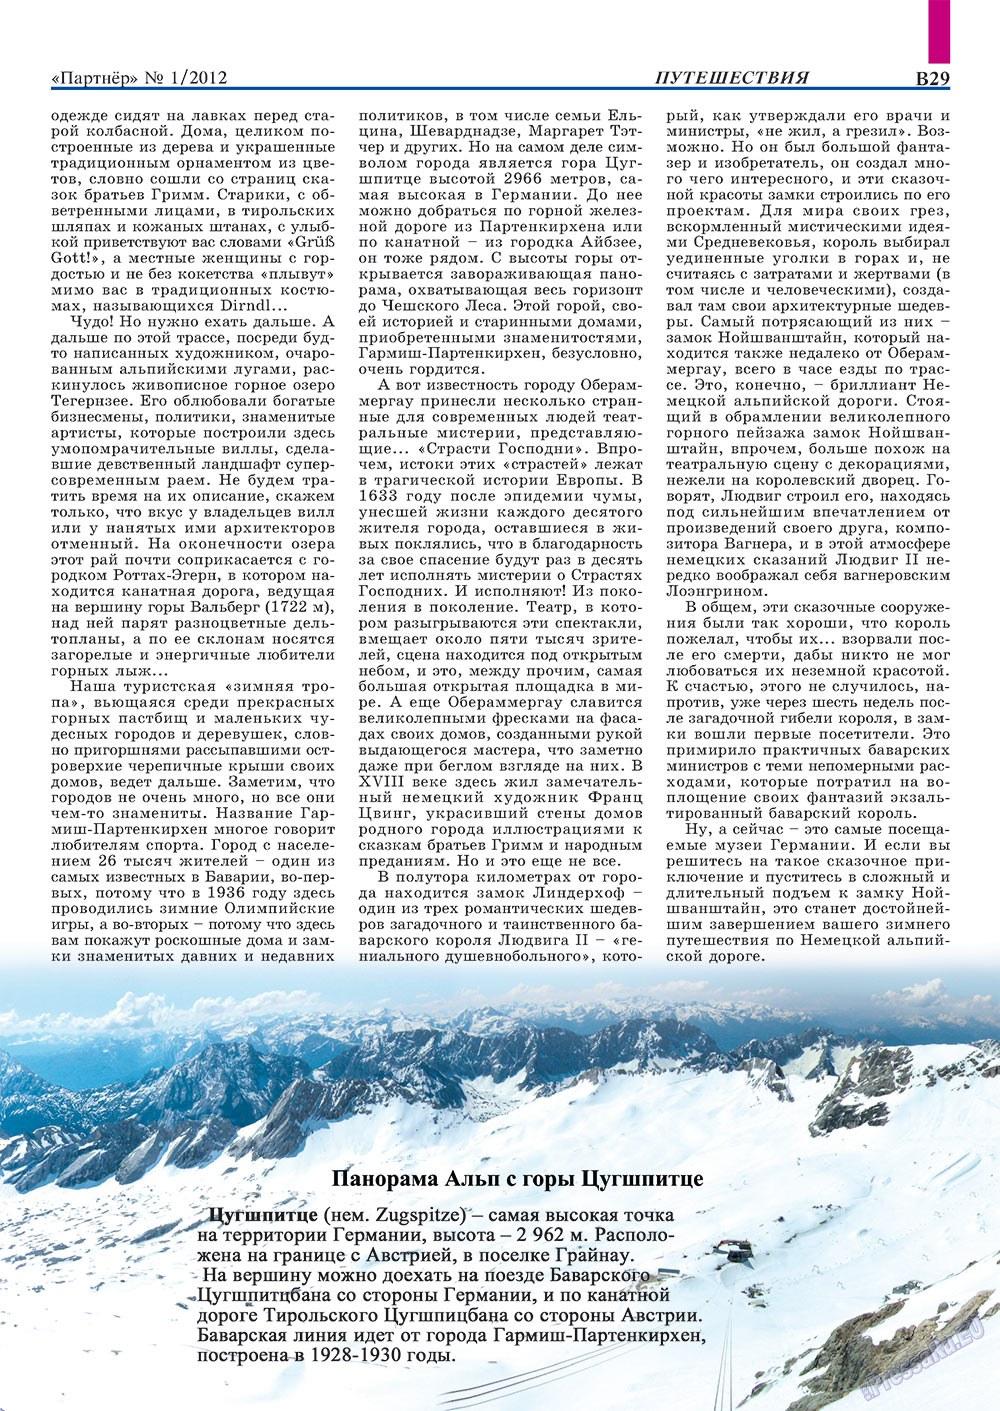 Партнер-север (журнал). 2012 год, номер 1, стр. 39